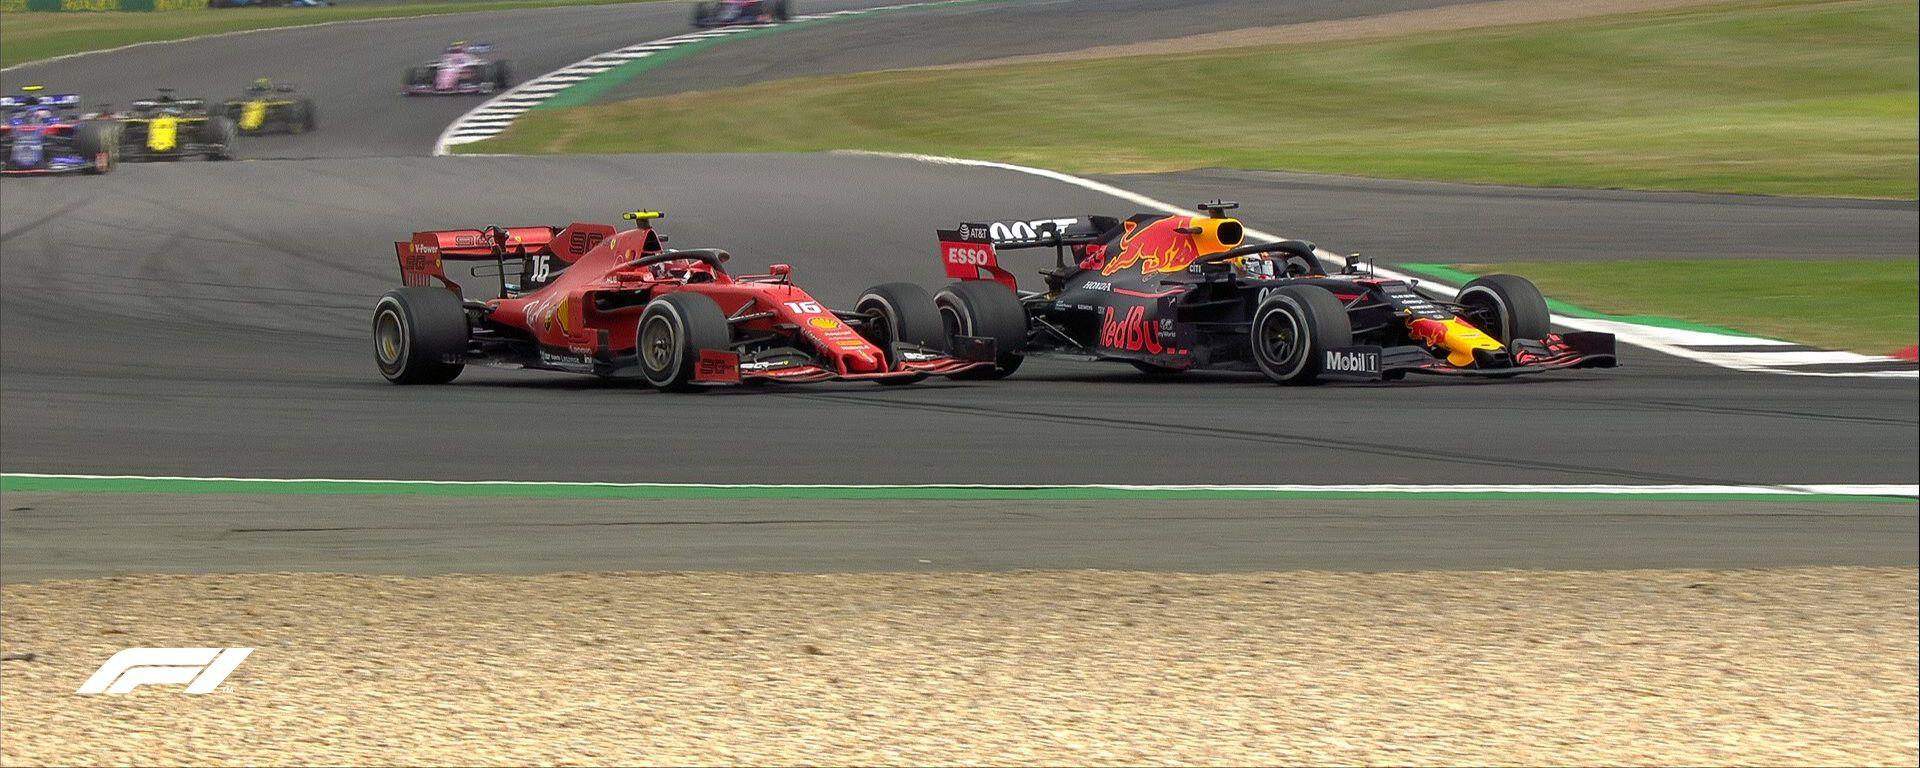 GP Gran Bretagna 2019, Charles Leclerc (Ferrari) in bagarre con Max Verstappen (Red Bull)